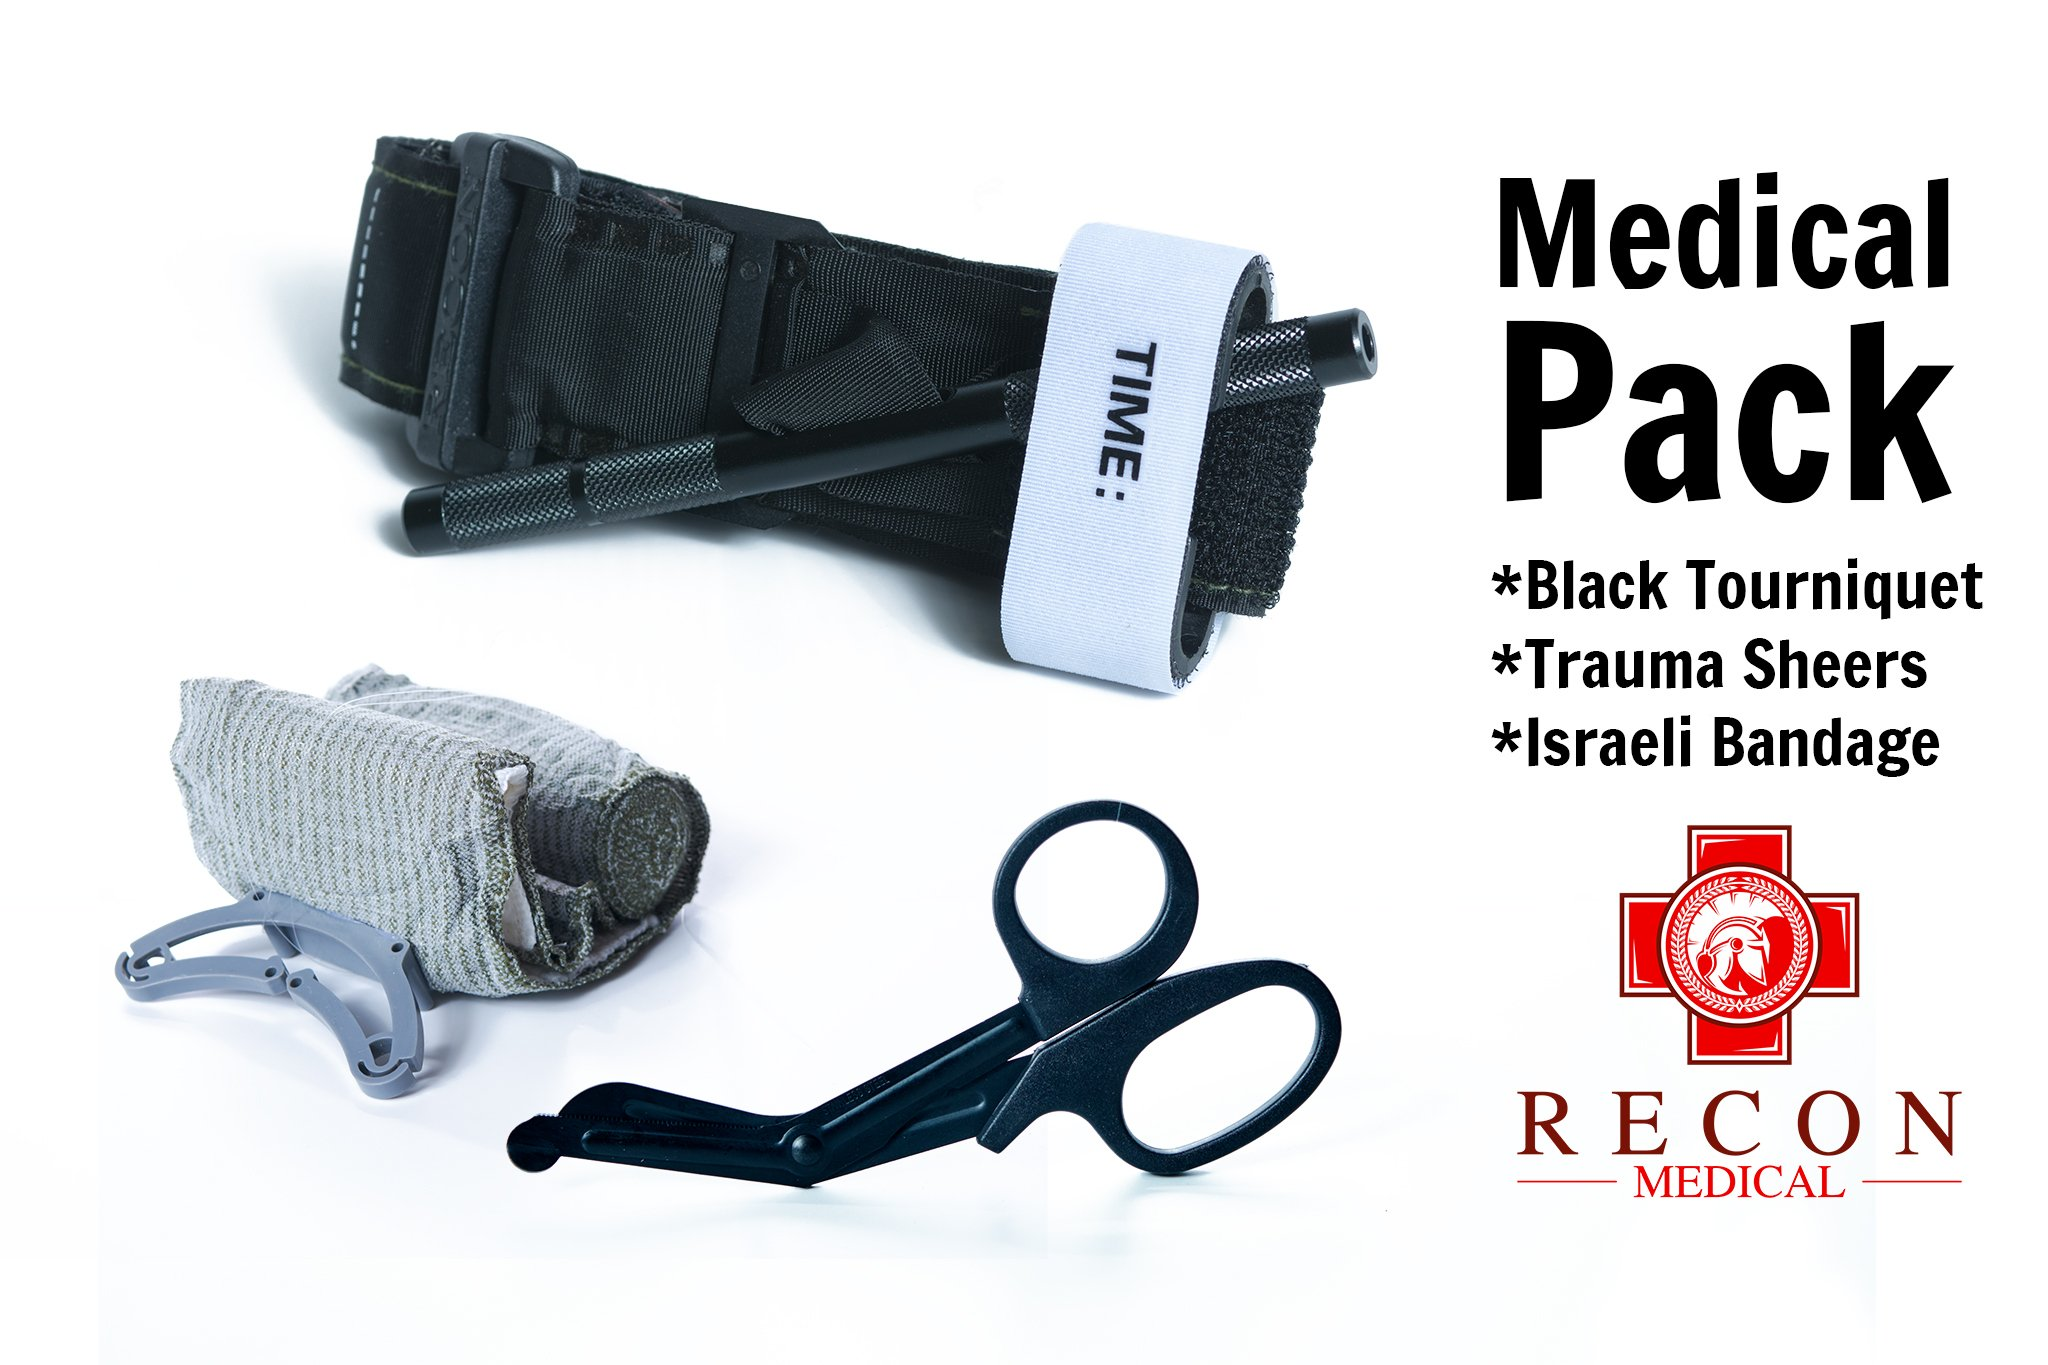 Recon Medical Pack -Includes Recon Medical Gen 3 Black Tourniquet Kevlar, Titanium Trauma Shears, Trauma Bandage First Aid Tactical SWAT Medic Pre-Hospital Life Saving Hemorrhage Control